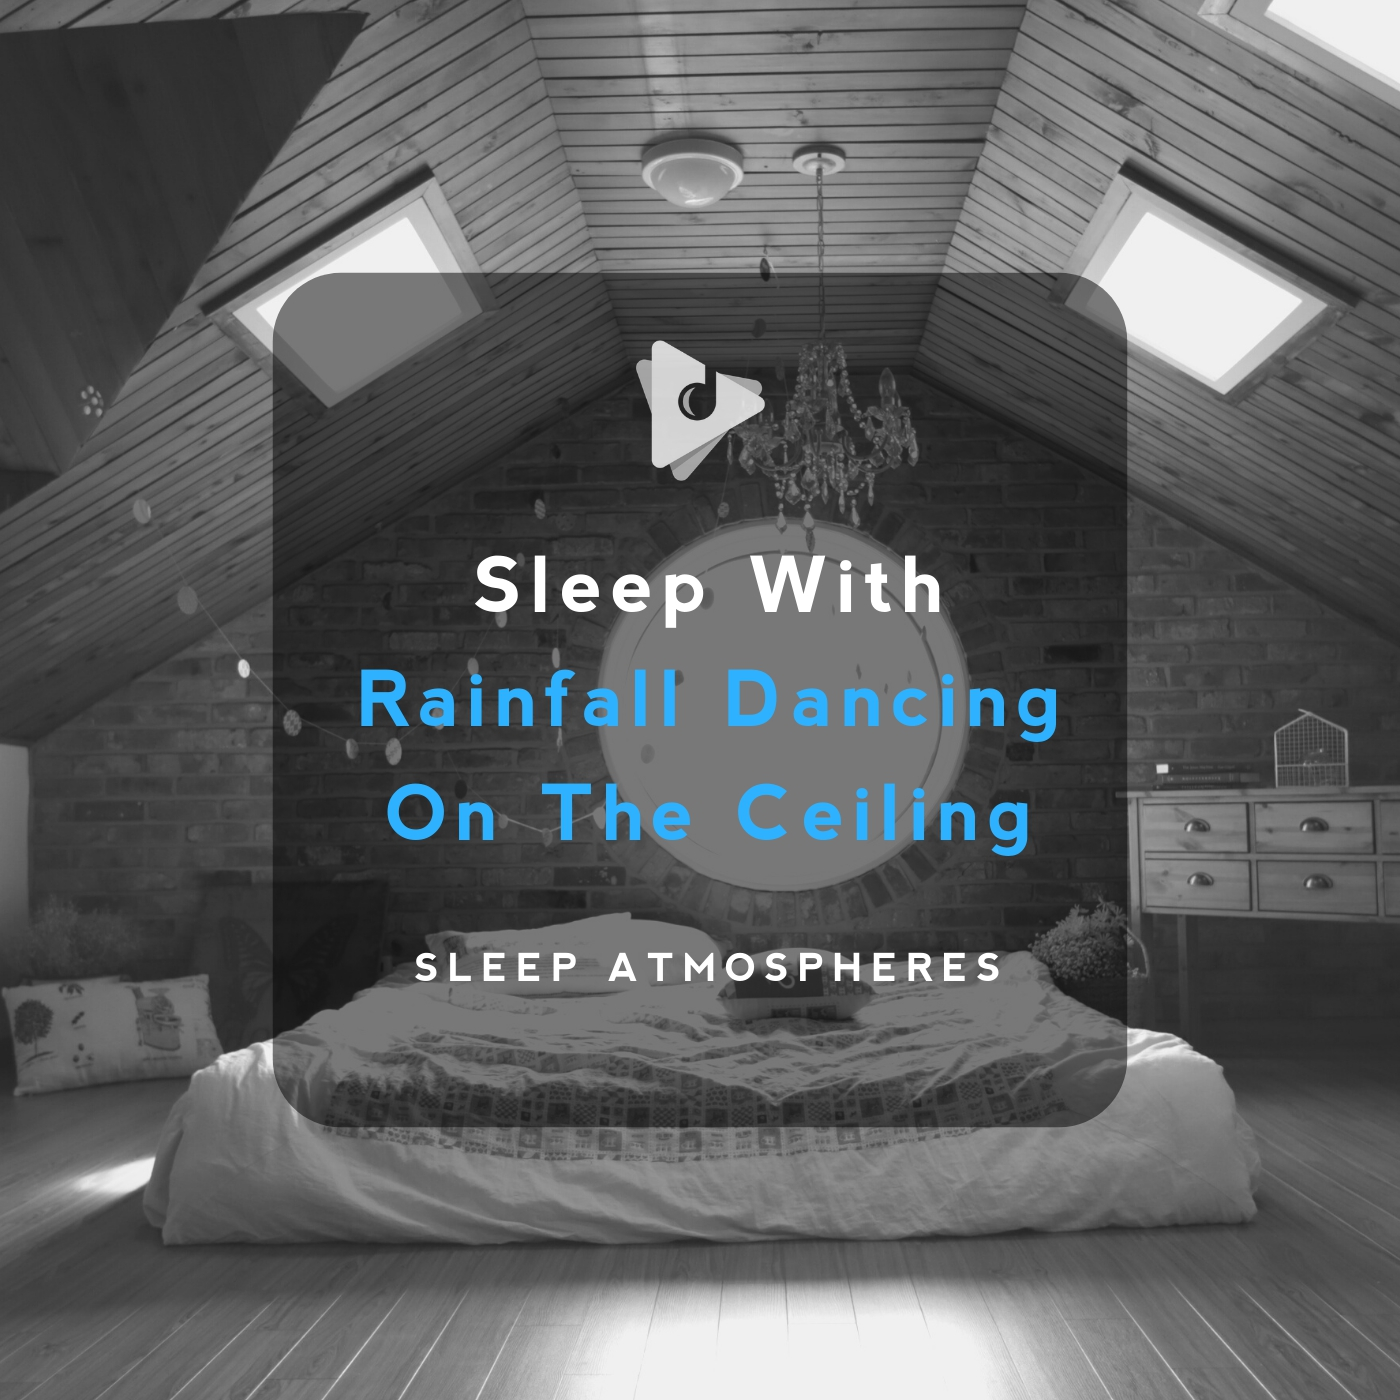 Sleep With Rainfall Dancing On The Ceiling